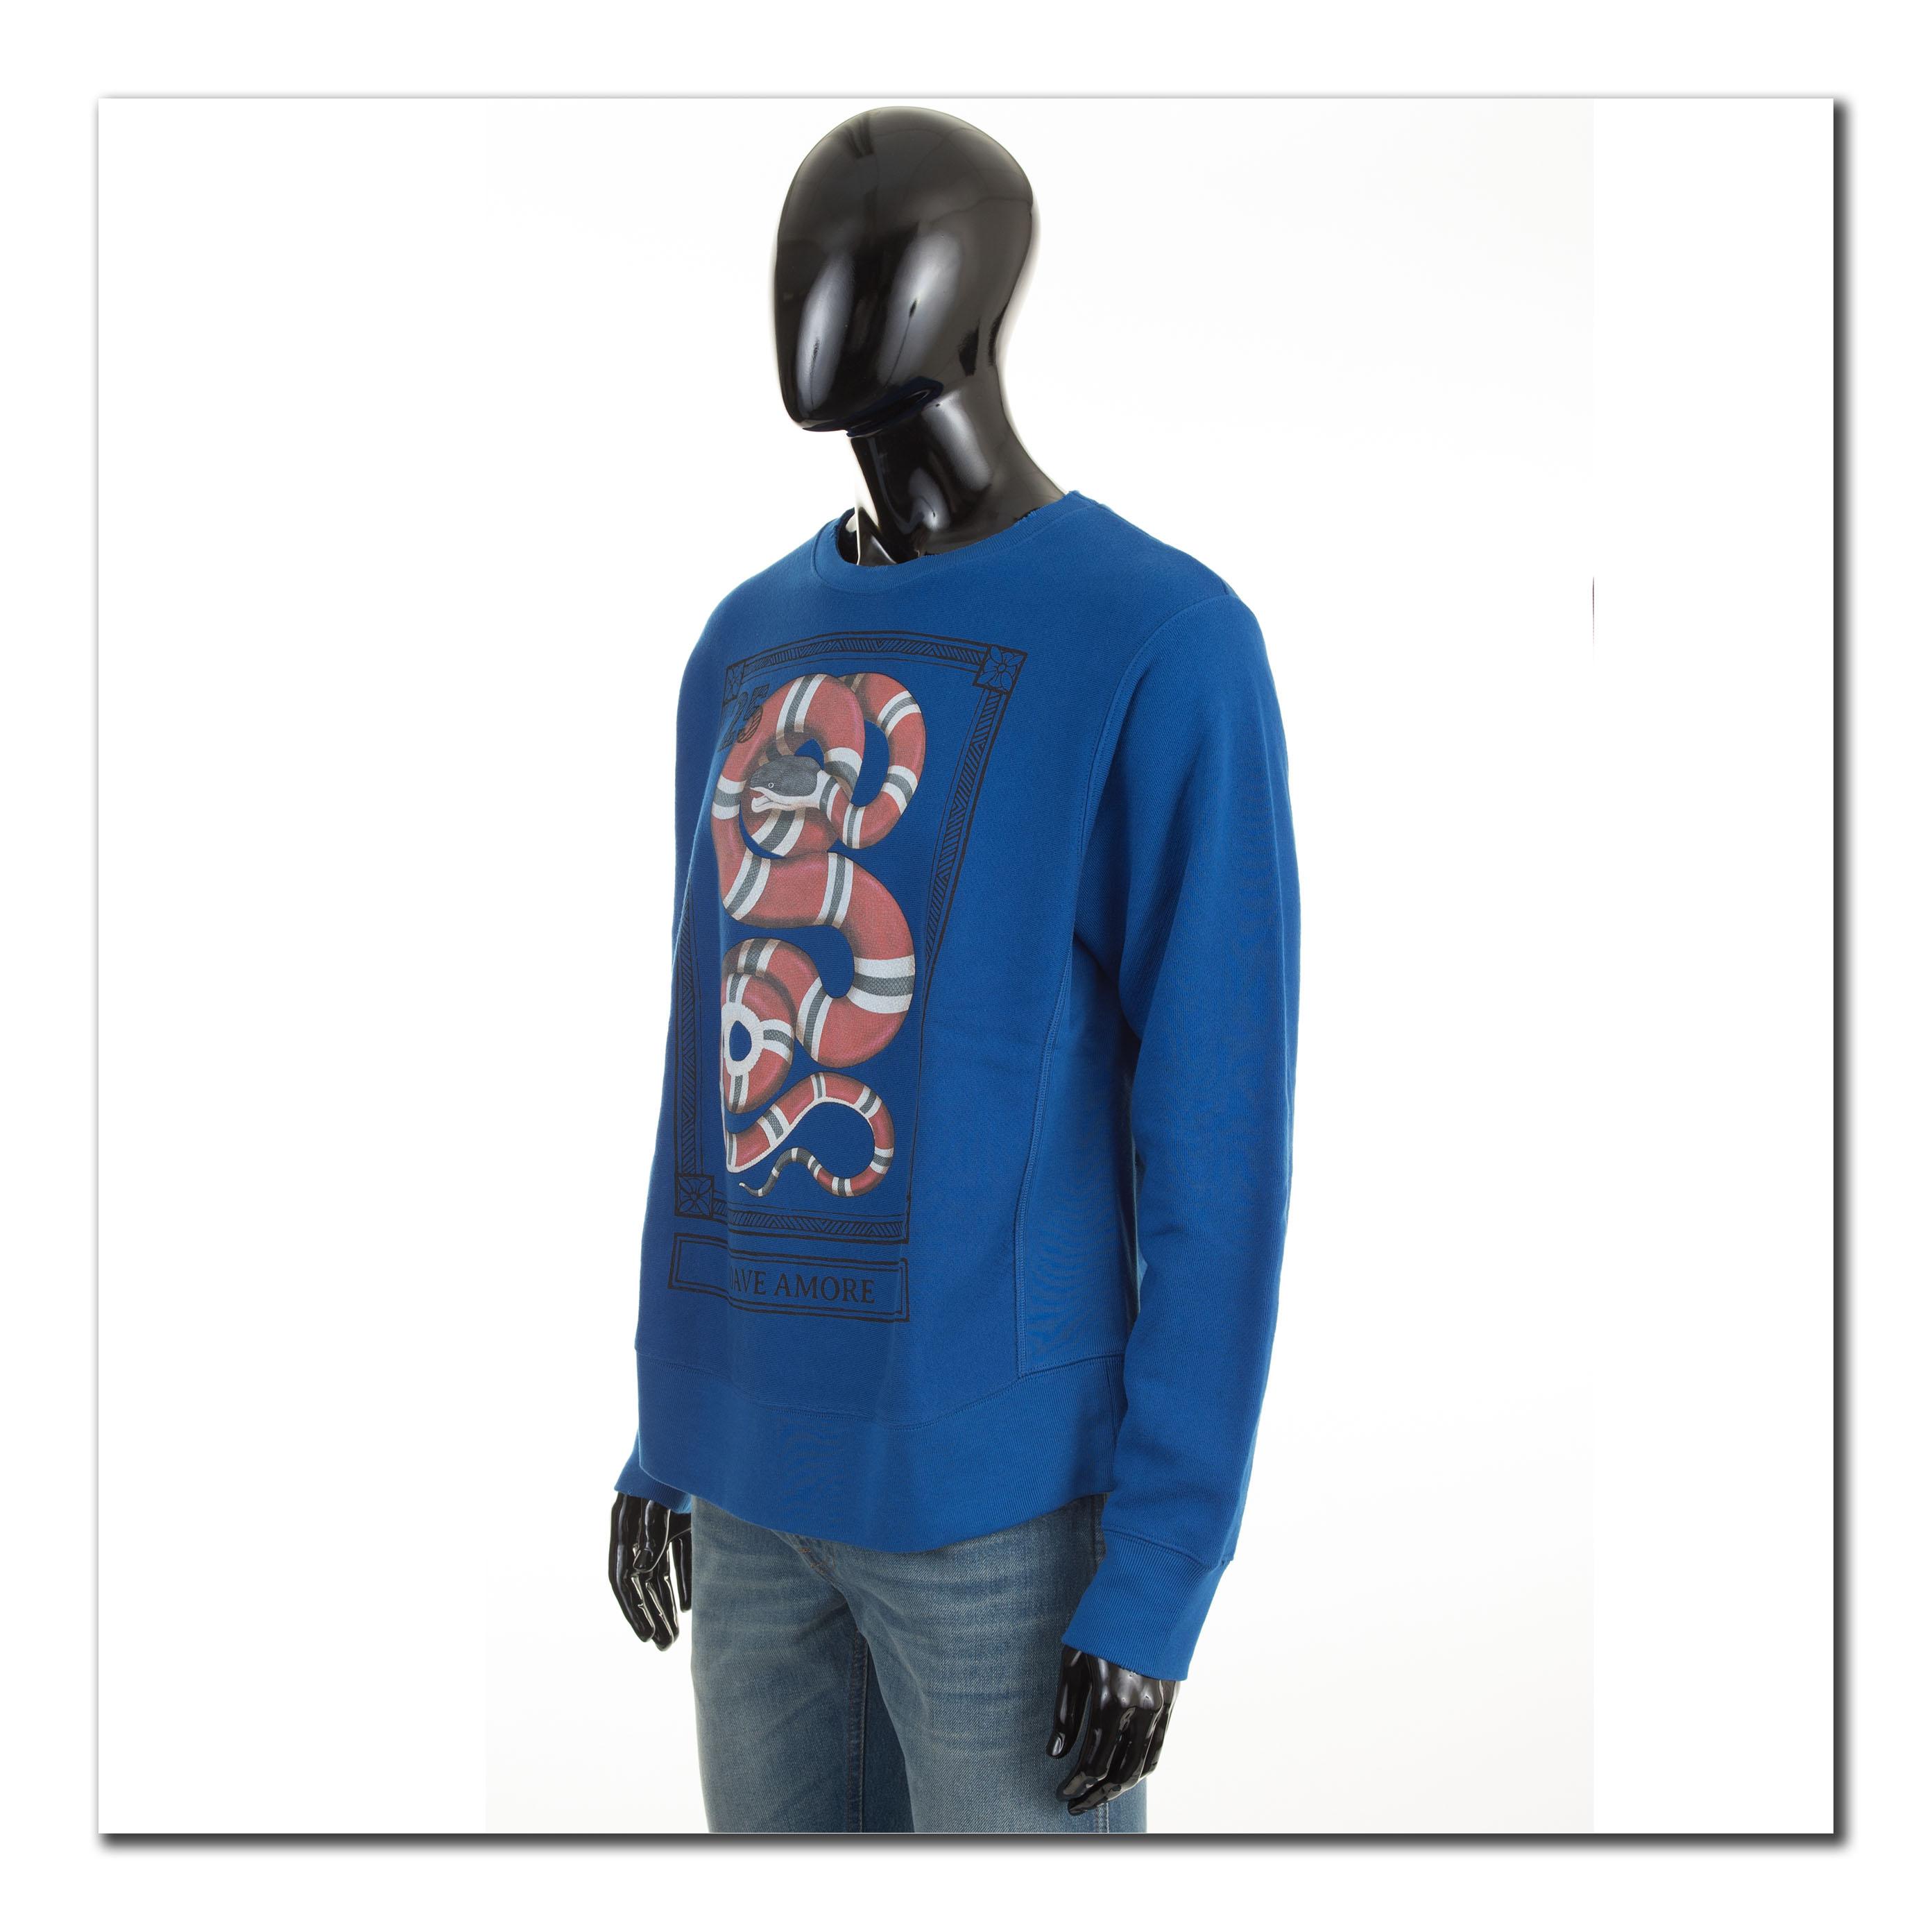 c16133d565ec GUCCI 890$ Authentic New Blue Cotton Sweatshirt With Kingsnake Print ...